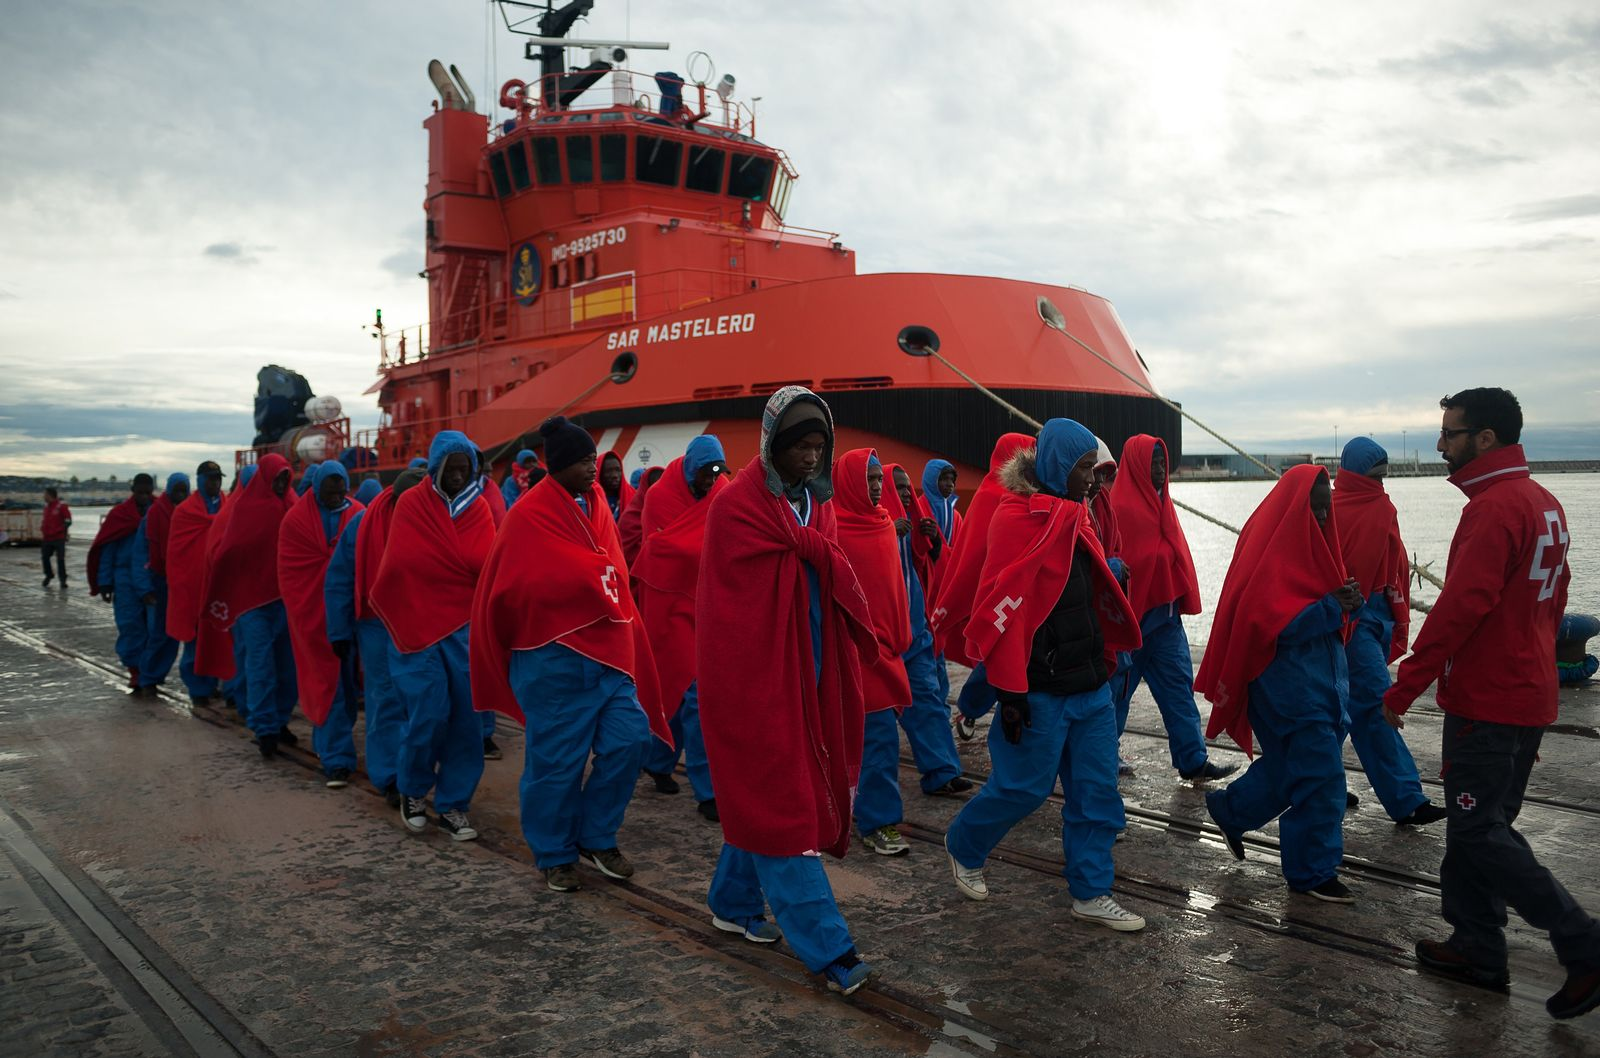 Flüchtlinge/ Malaga/ Rettung/ Alboran